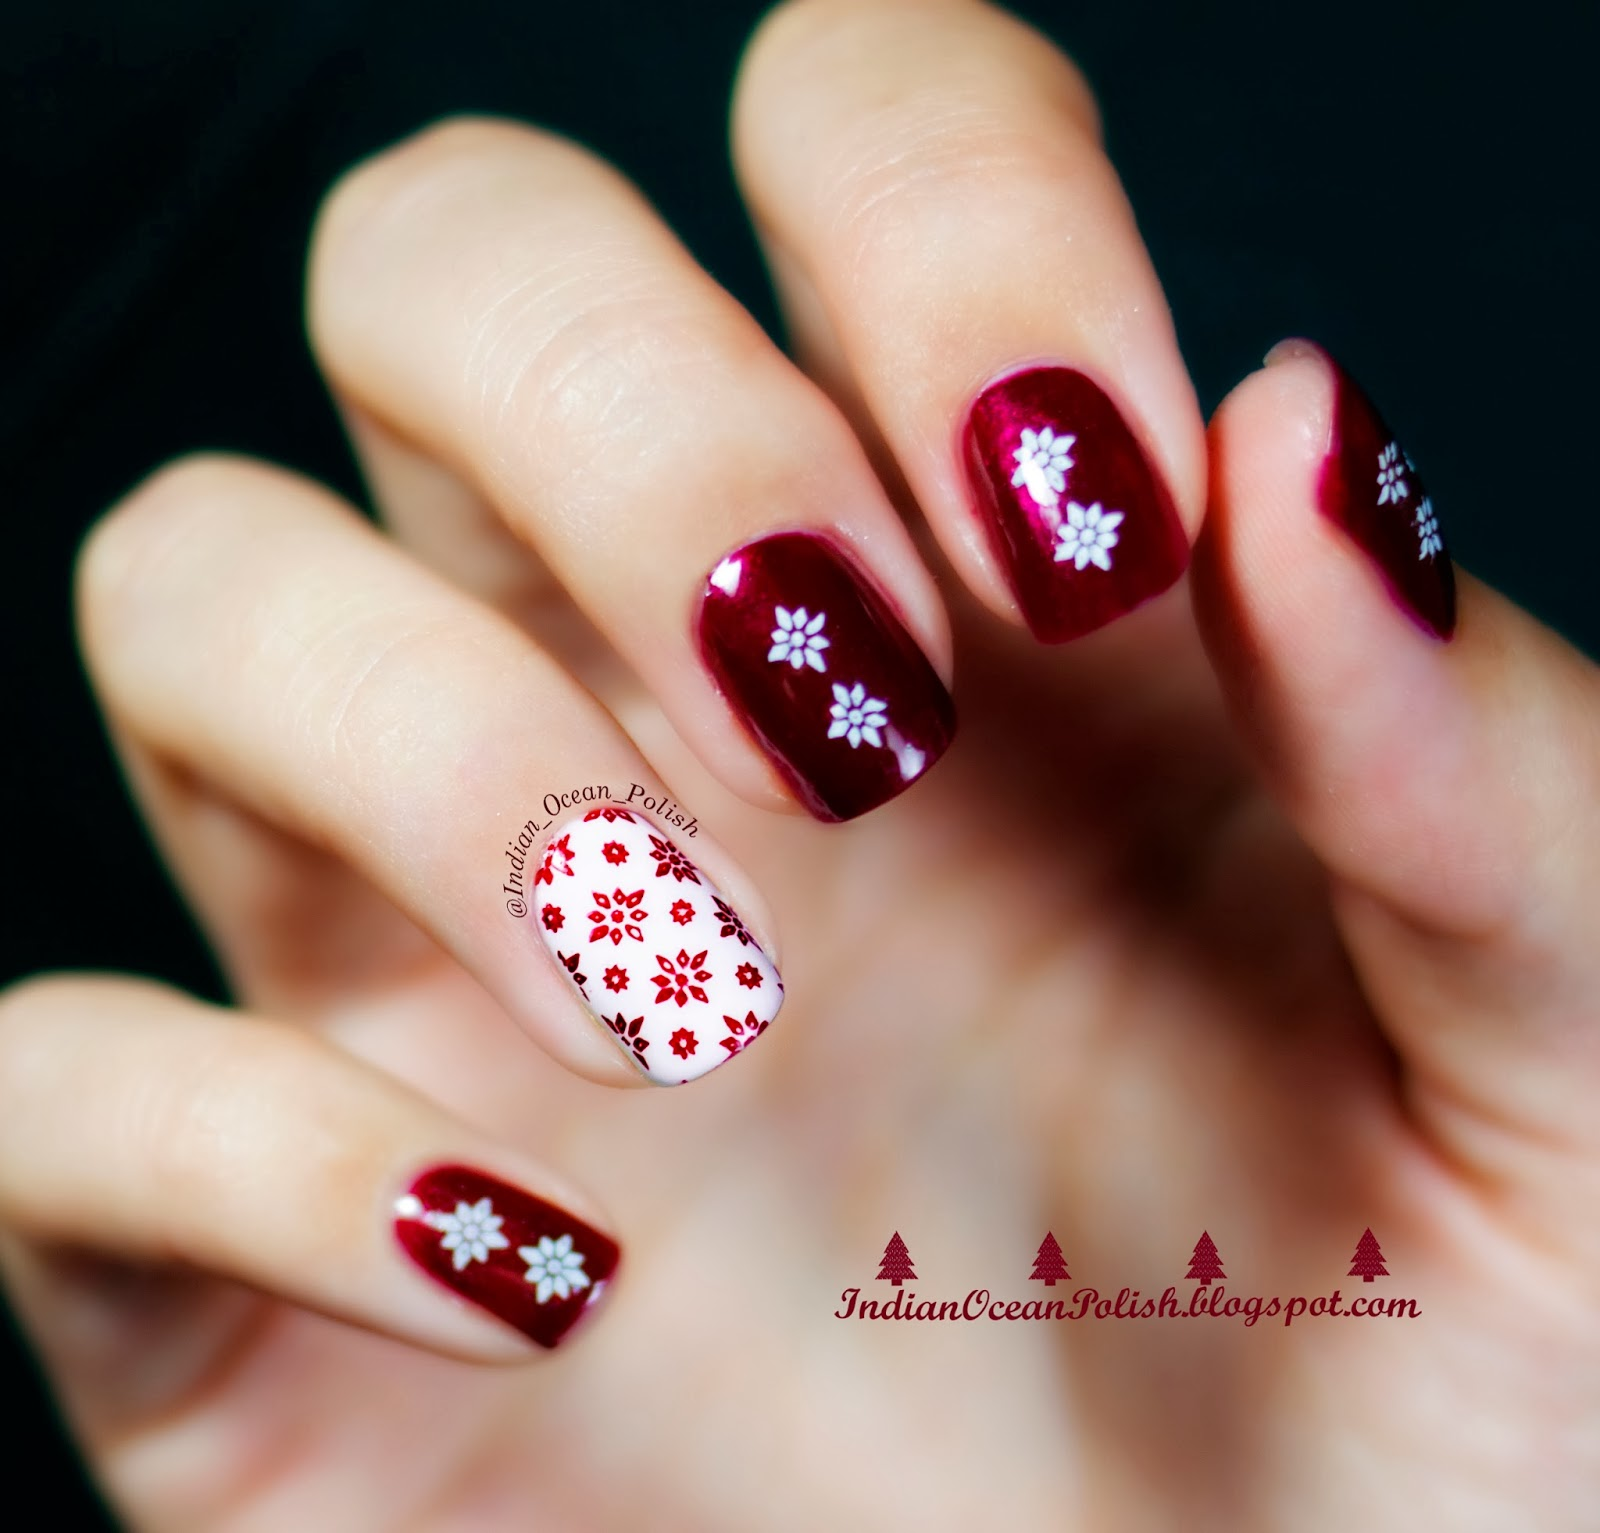 Simple Christmas Nail Art: Indian Ocean Polish: Christmas 2013 Nail Art Ideas: Simple